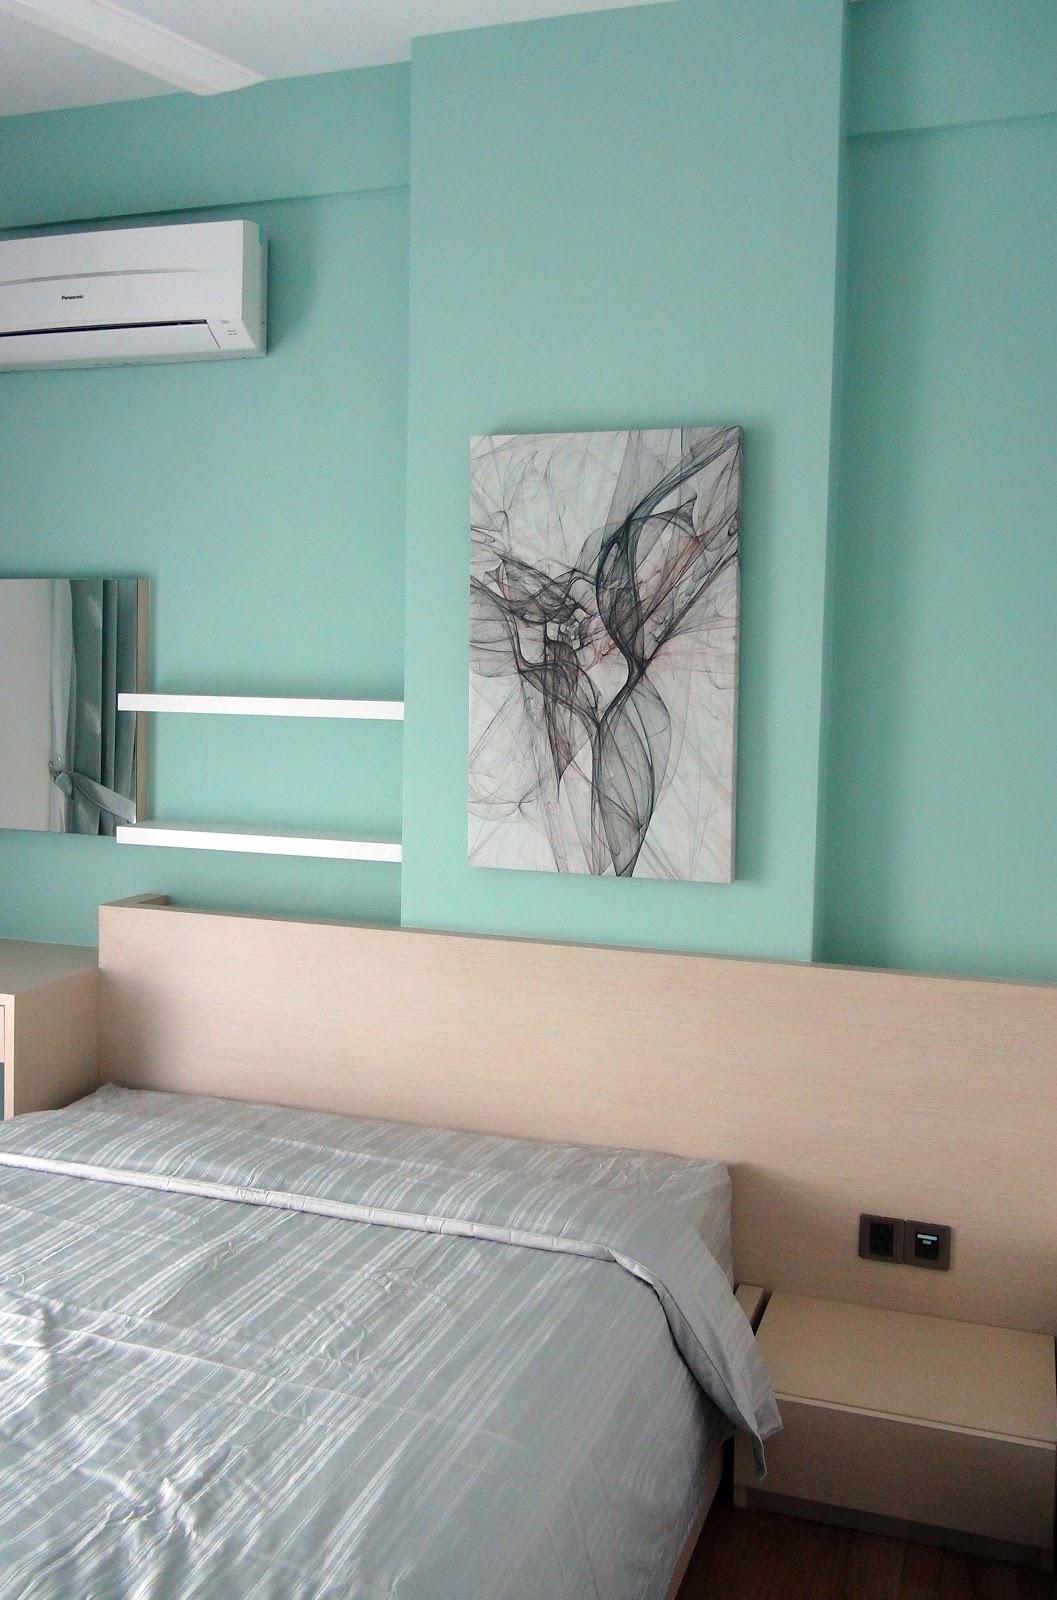 artbug buzzing  the brezza condominium tanjung tokong